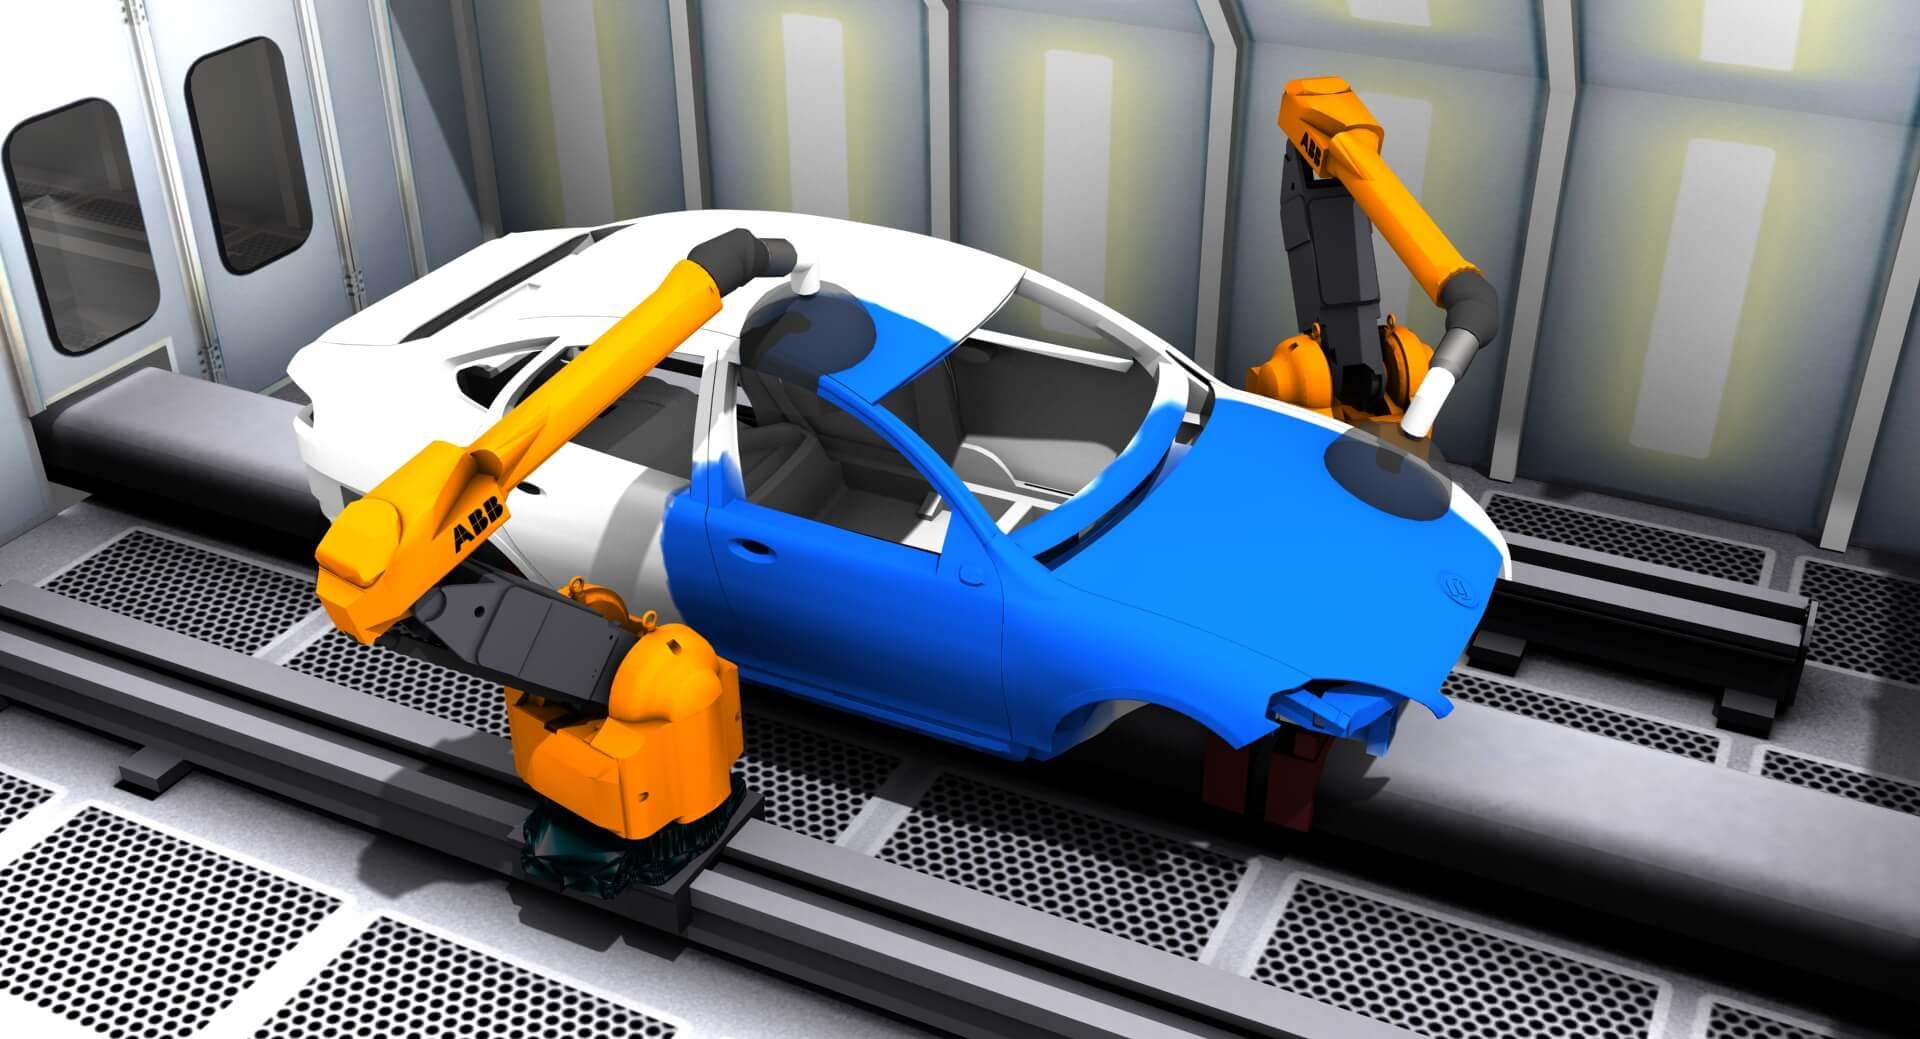 Delfoi Robotics Software - Delfoi PAINT Lackierlinie mit ABB-Robotern